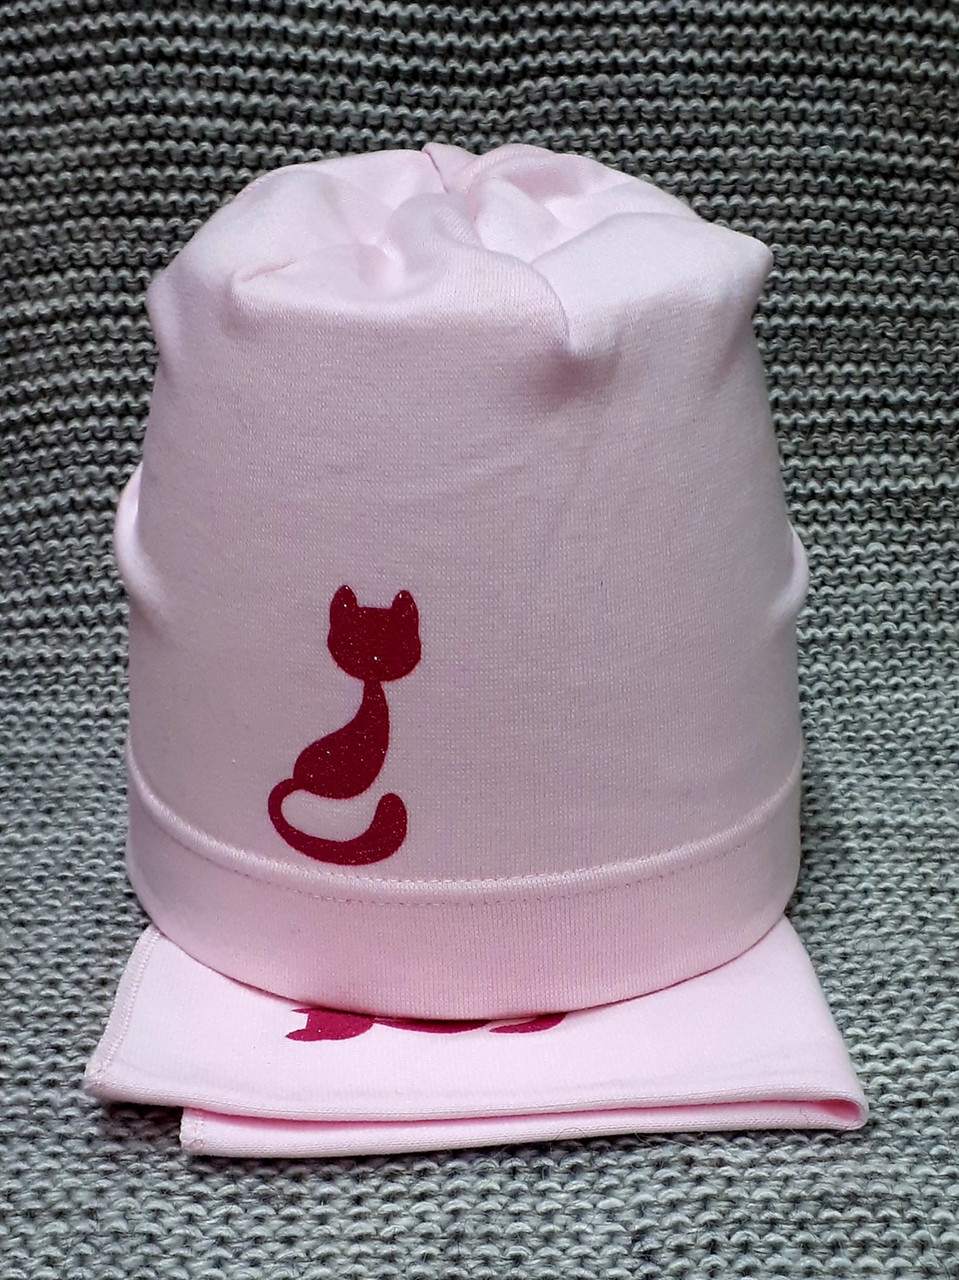 Комплект шапка + хомут весна-осень на девочку розового цвета AGBO (Польша)  размер 46 48 50